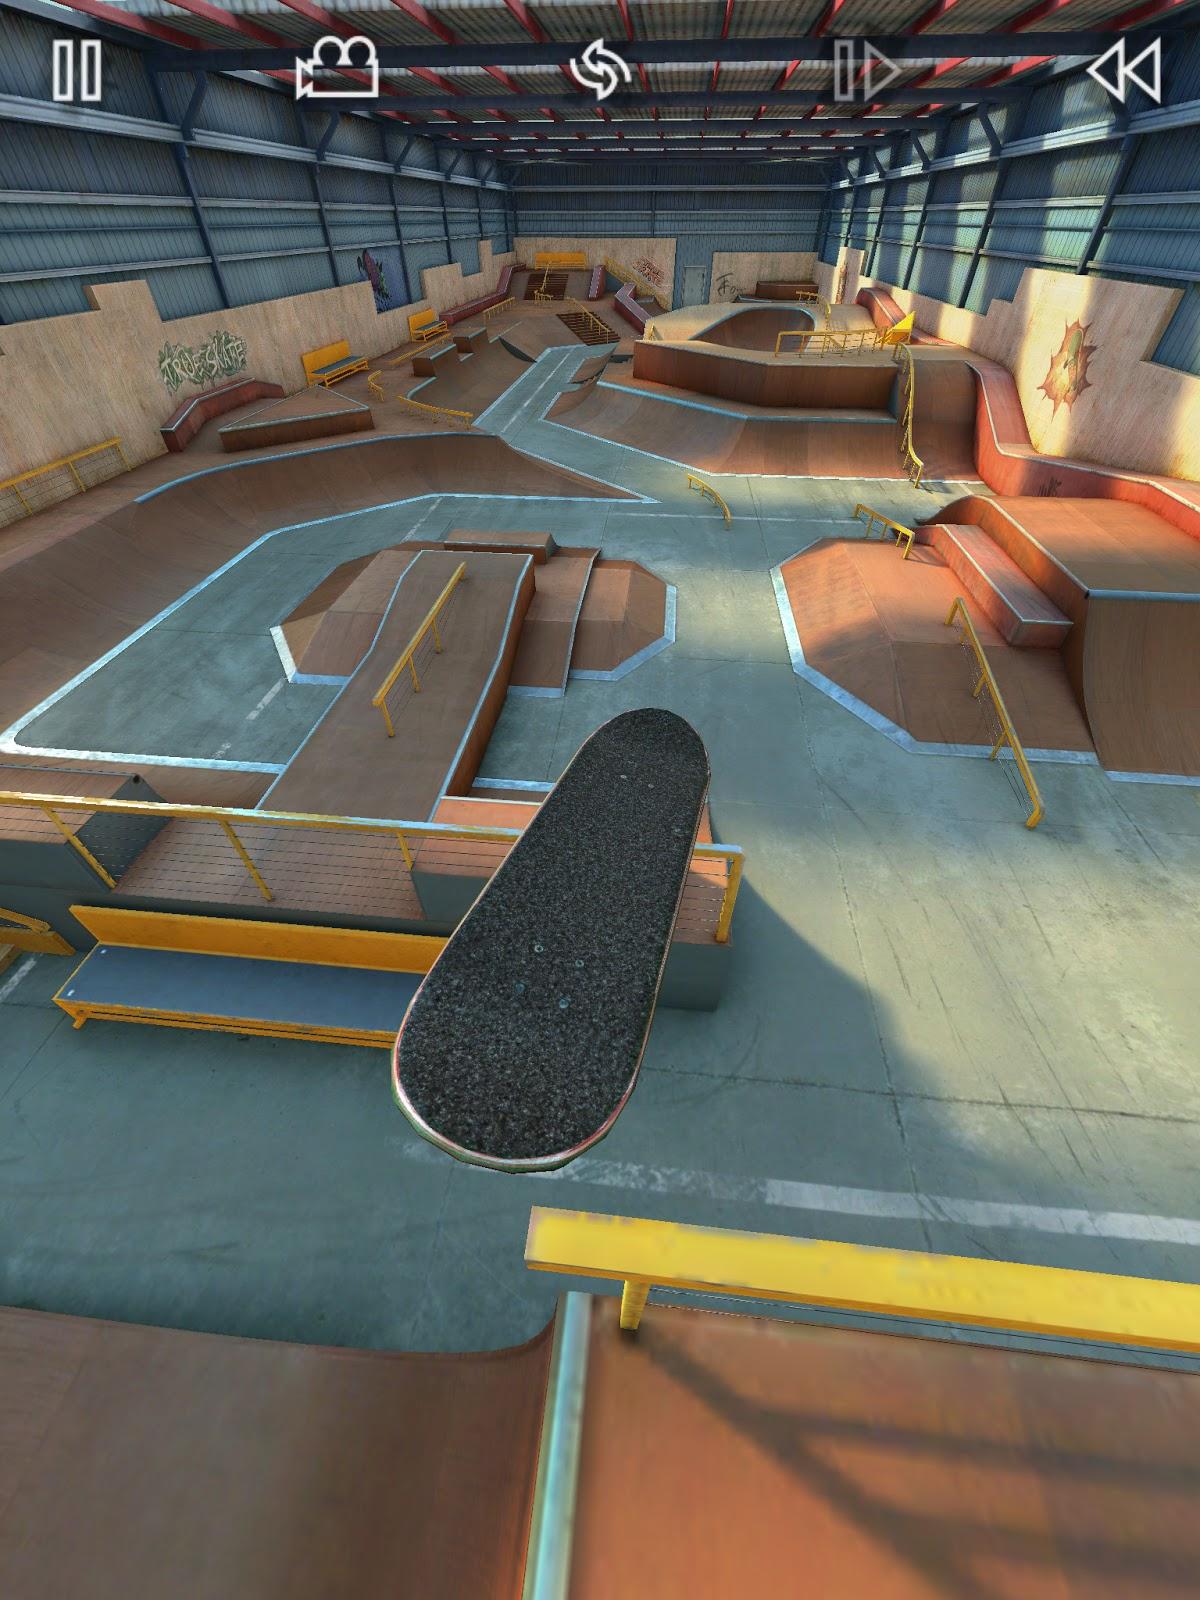 🔥 True Skate MOD apk Free Unlock All Maps